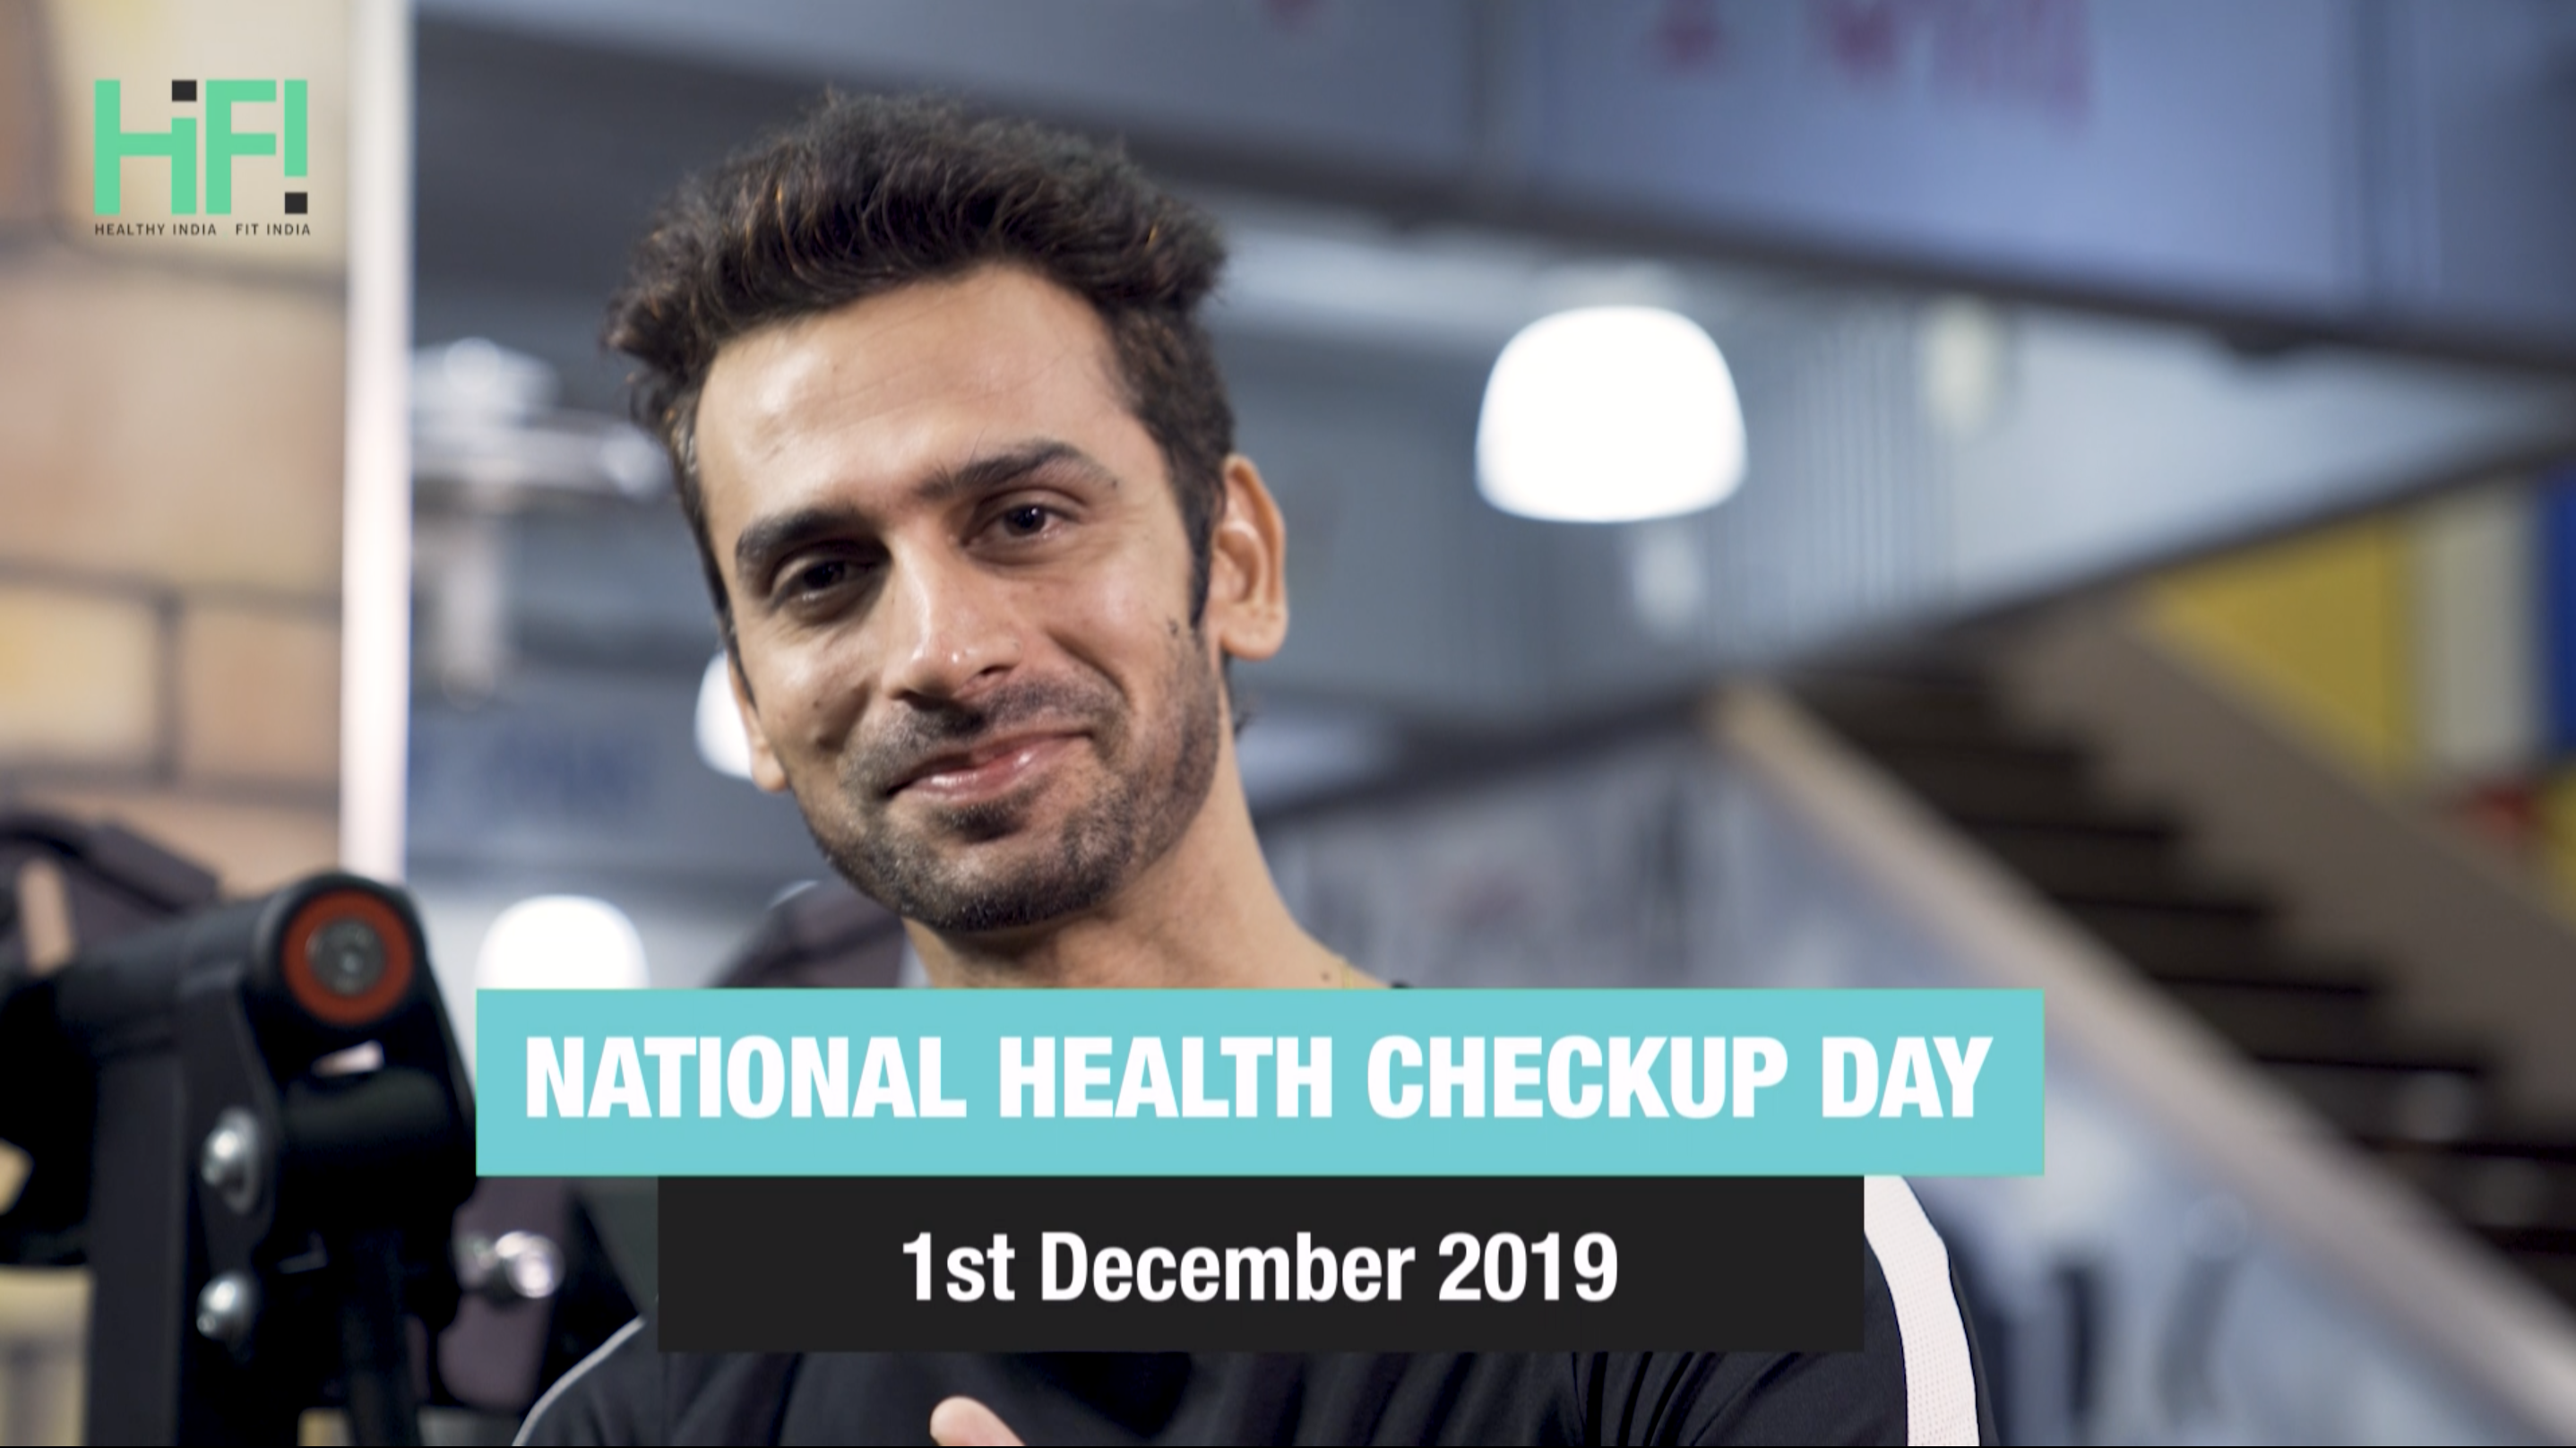 Hi-Fi champ Manoj Chandila vows to get a health check-up on Dec. 1